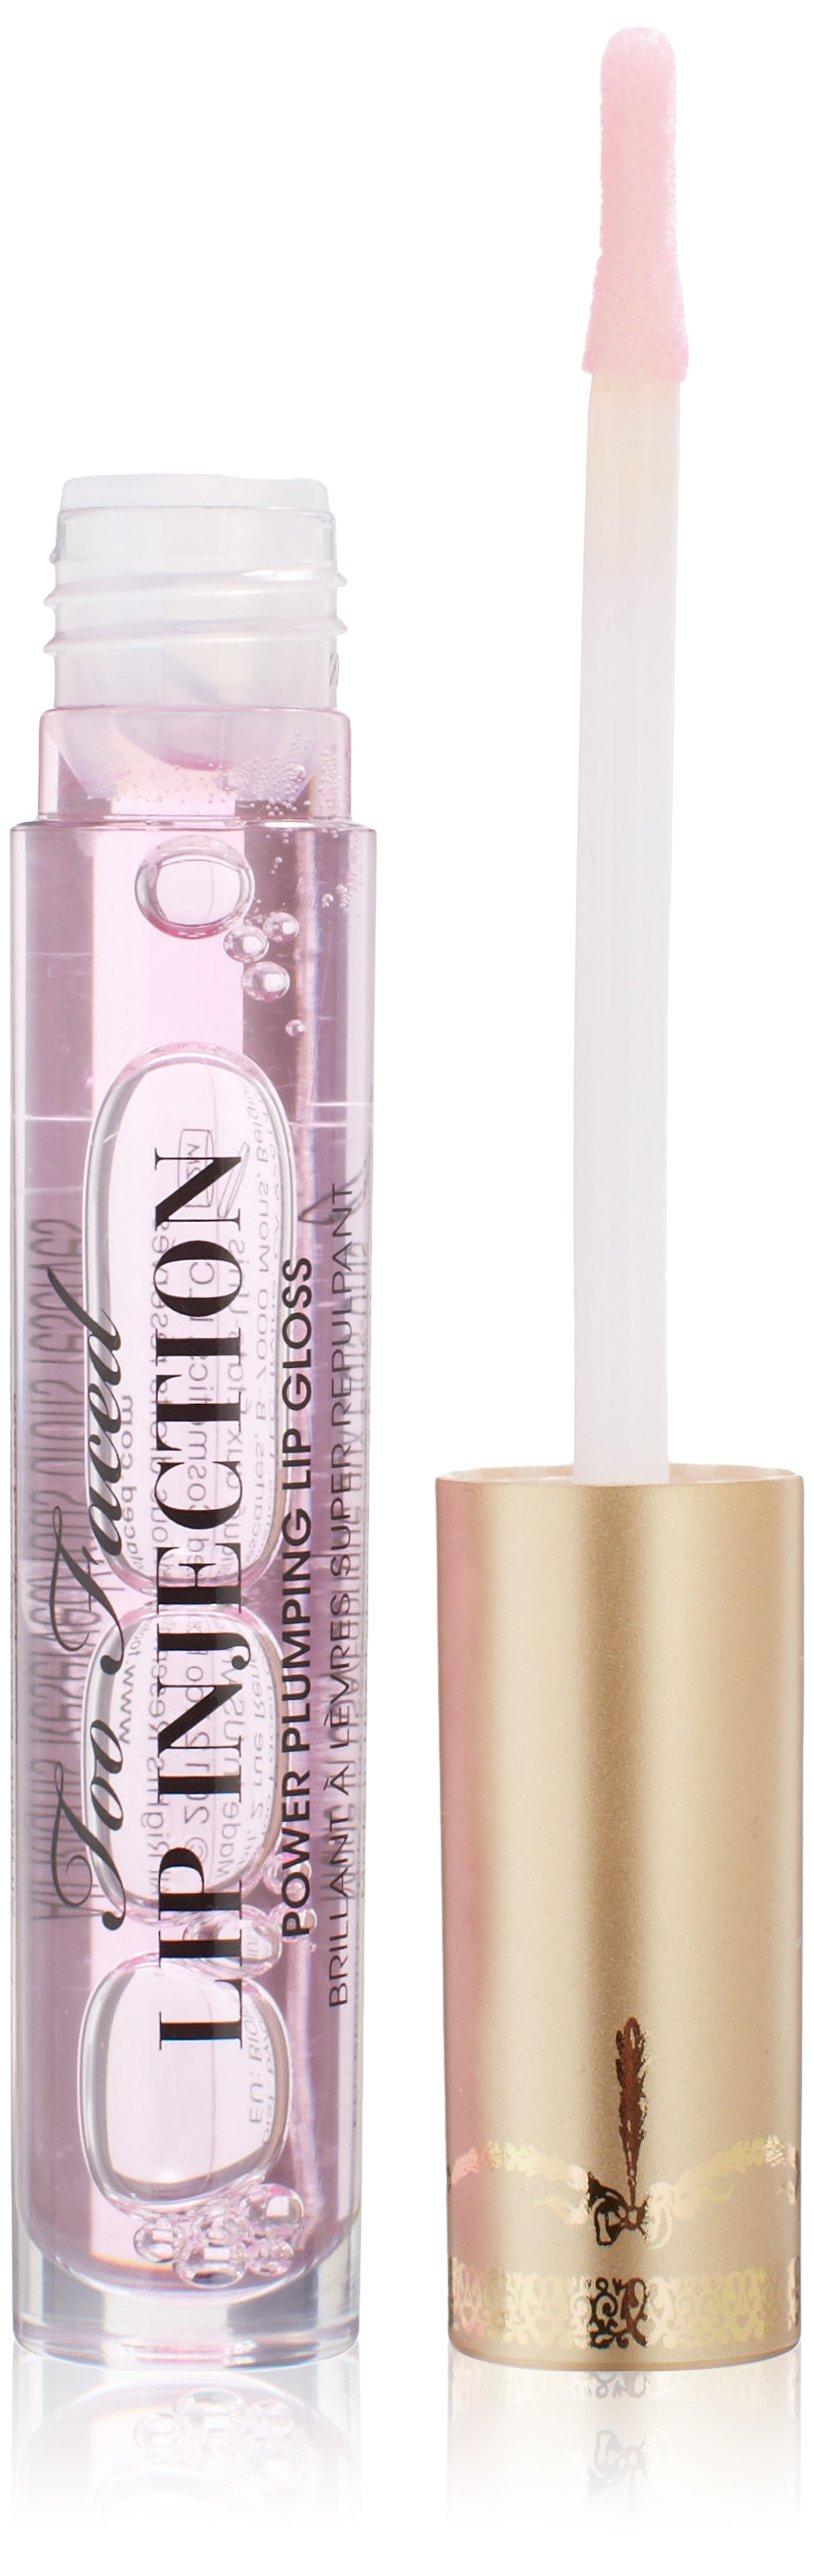 WonderFull Lip Plumping Gloss with Maxi Lip by prestige #10